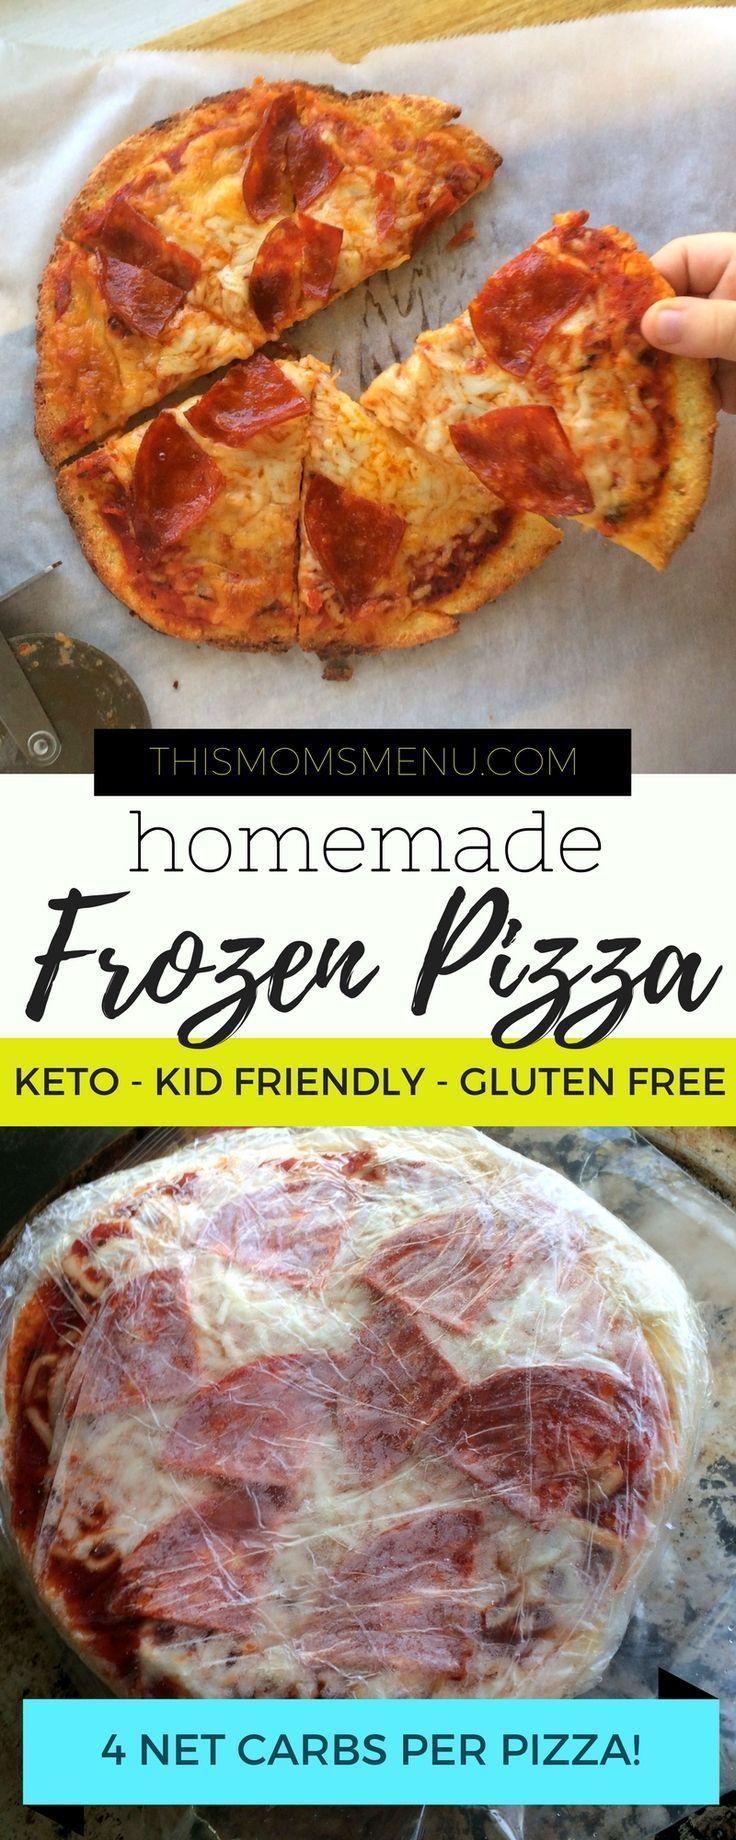 Homemade Frozen Pizza, Keto Pizza, Gluten free, grain free, DIY frozen pizza #KetogenicDietMenu